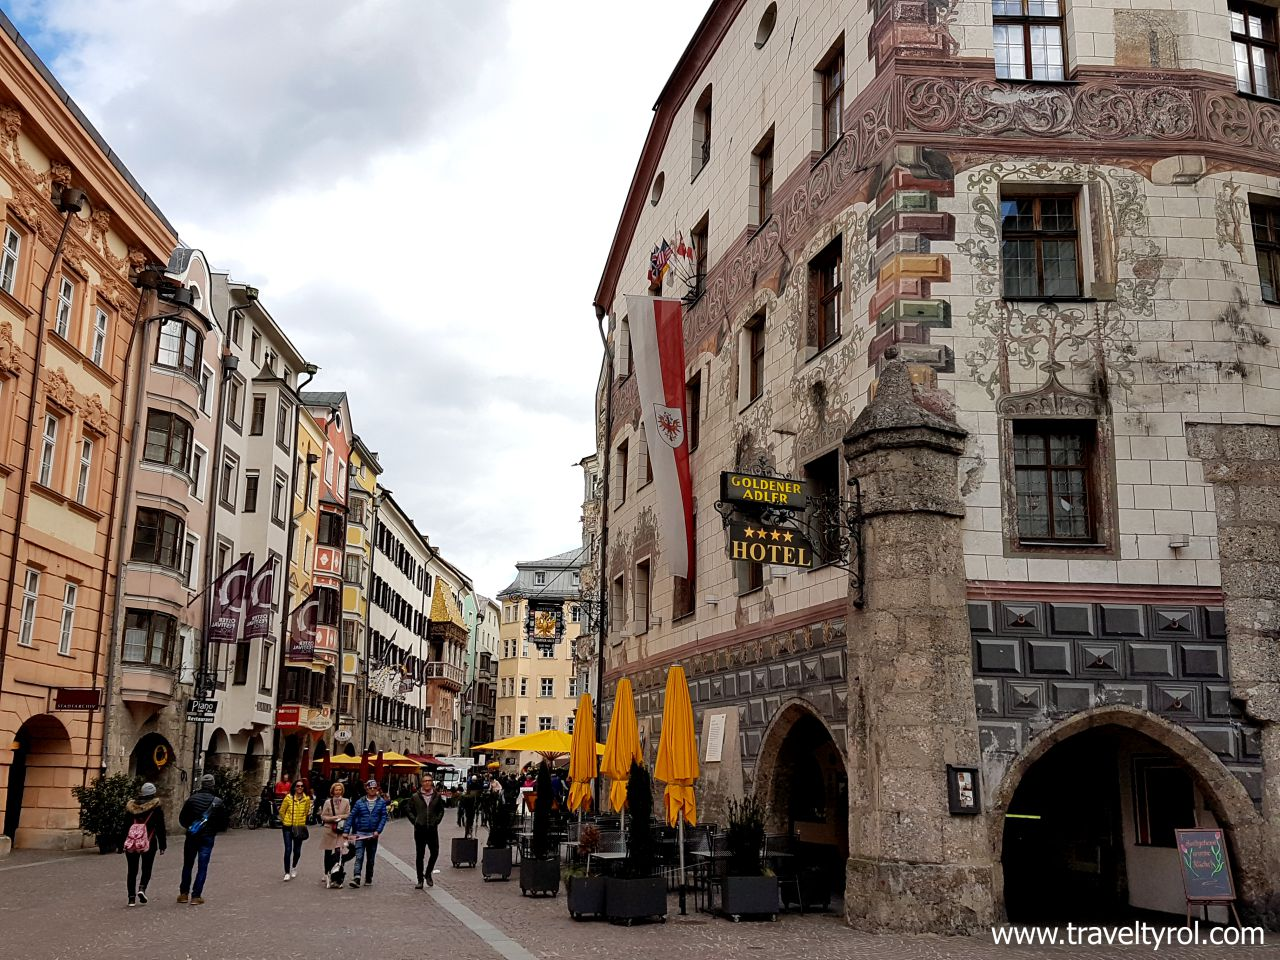 Top 10 Things To See In Innsbruck Old Town Travel Tyrol